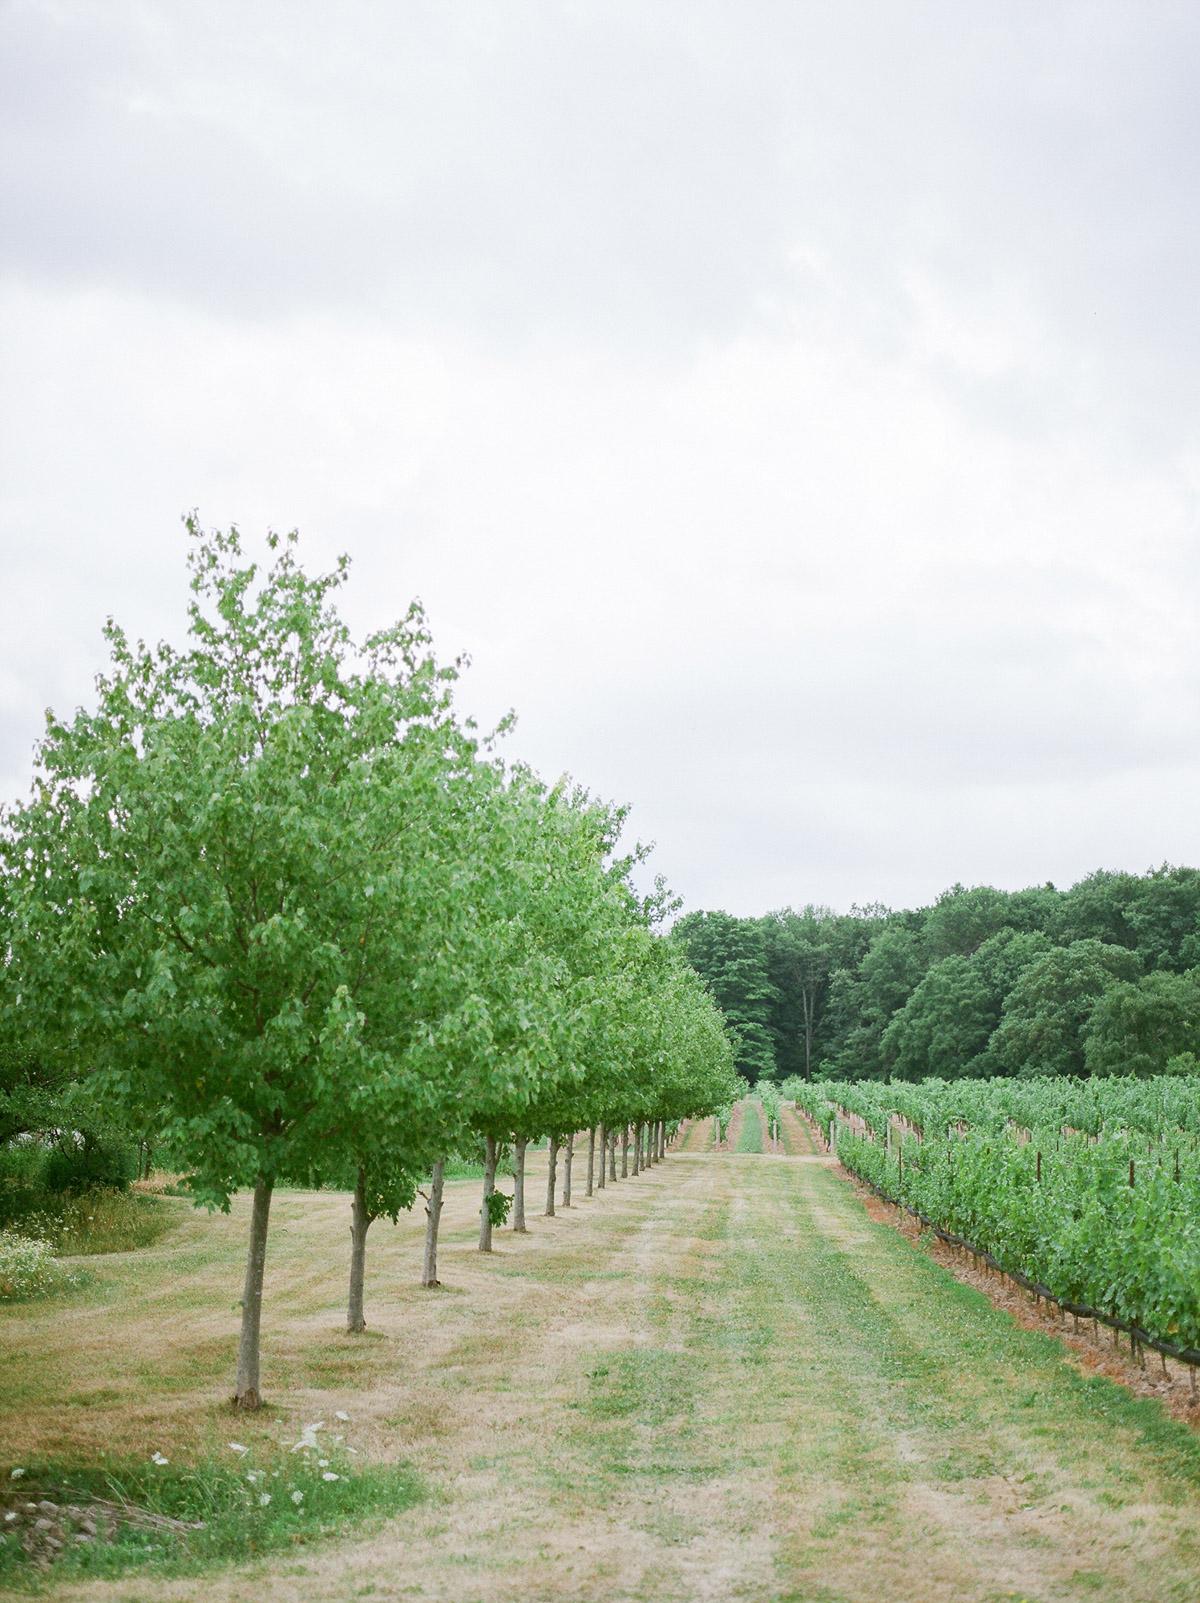 jennifer-xu-photography-vineyard-bride-swish-list-rosewod-eatstes-winery-beamsville-wedding-editorial-21.jpg